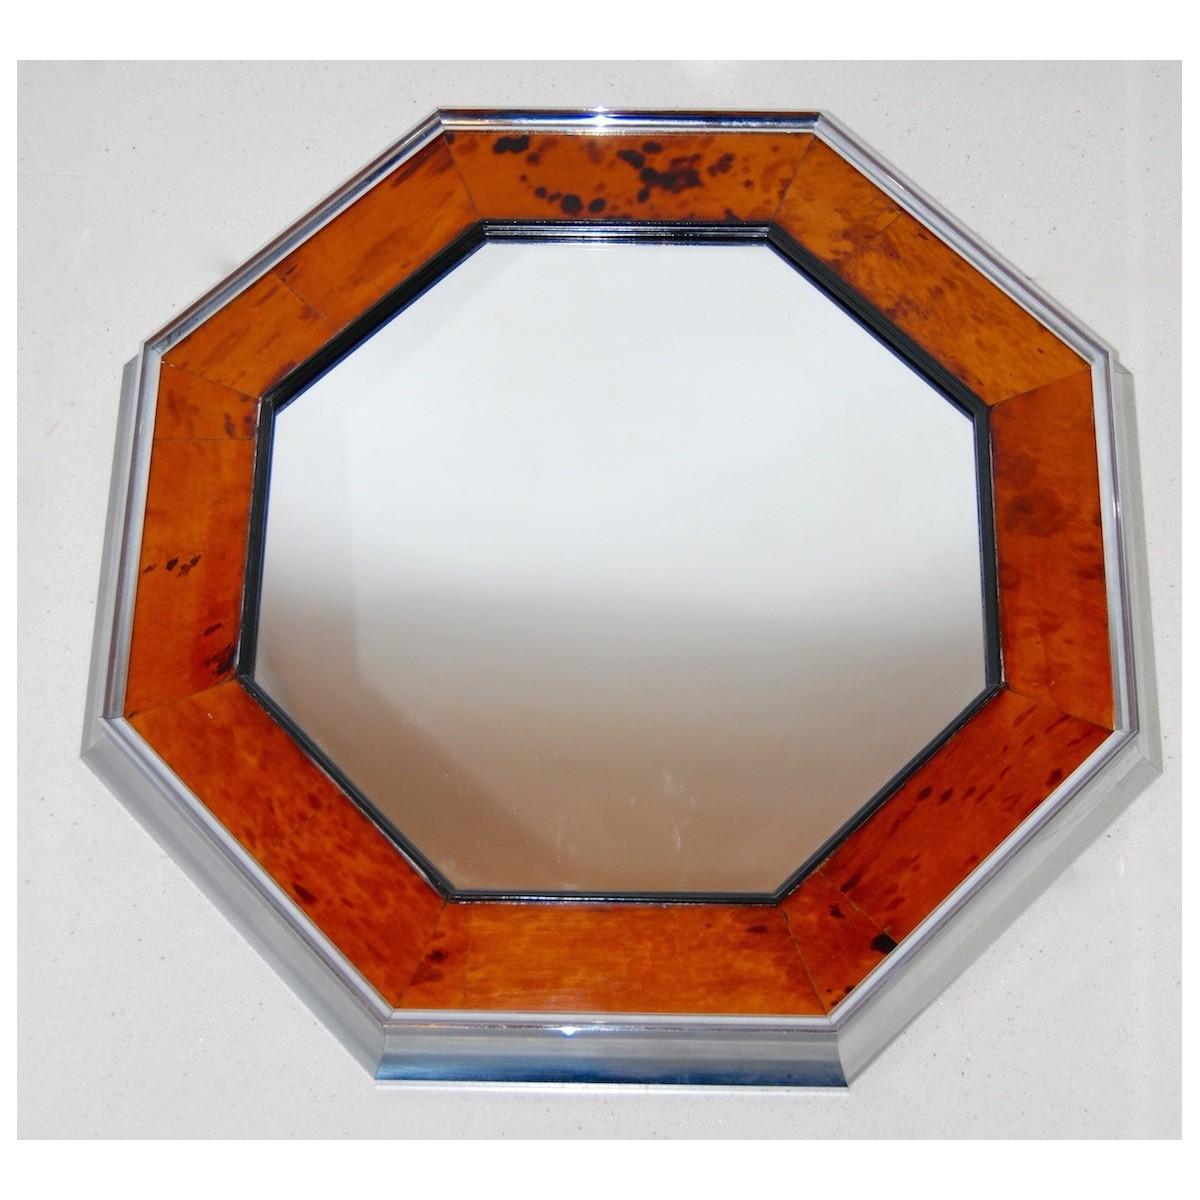 Design mirror of the 60s